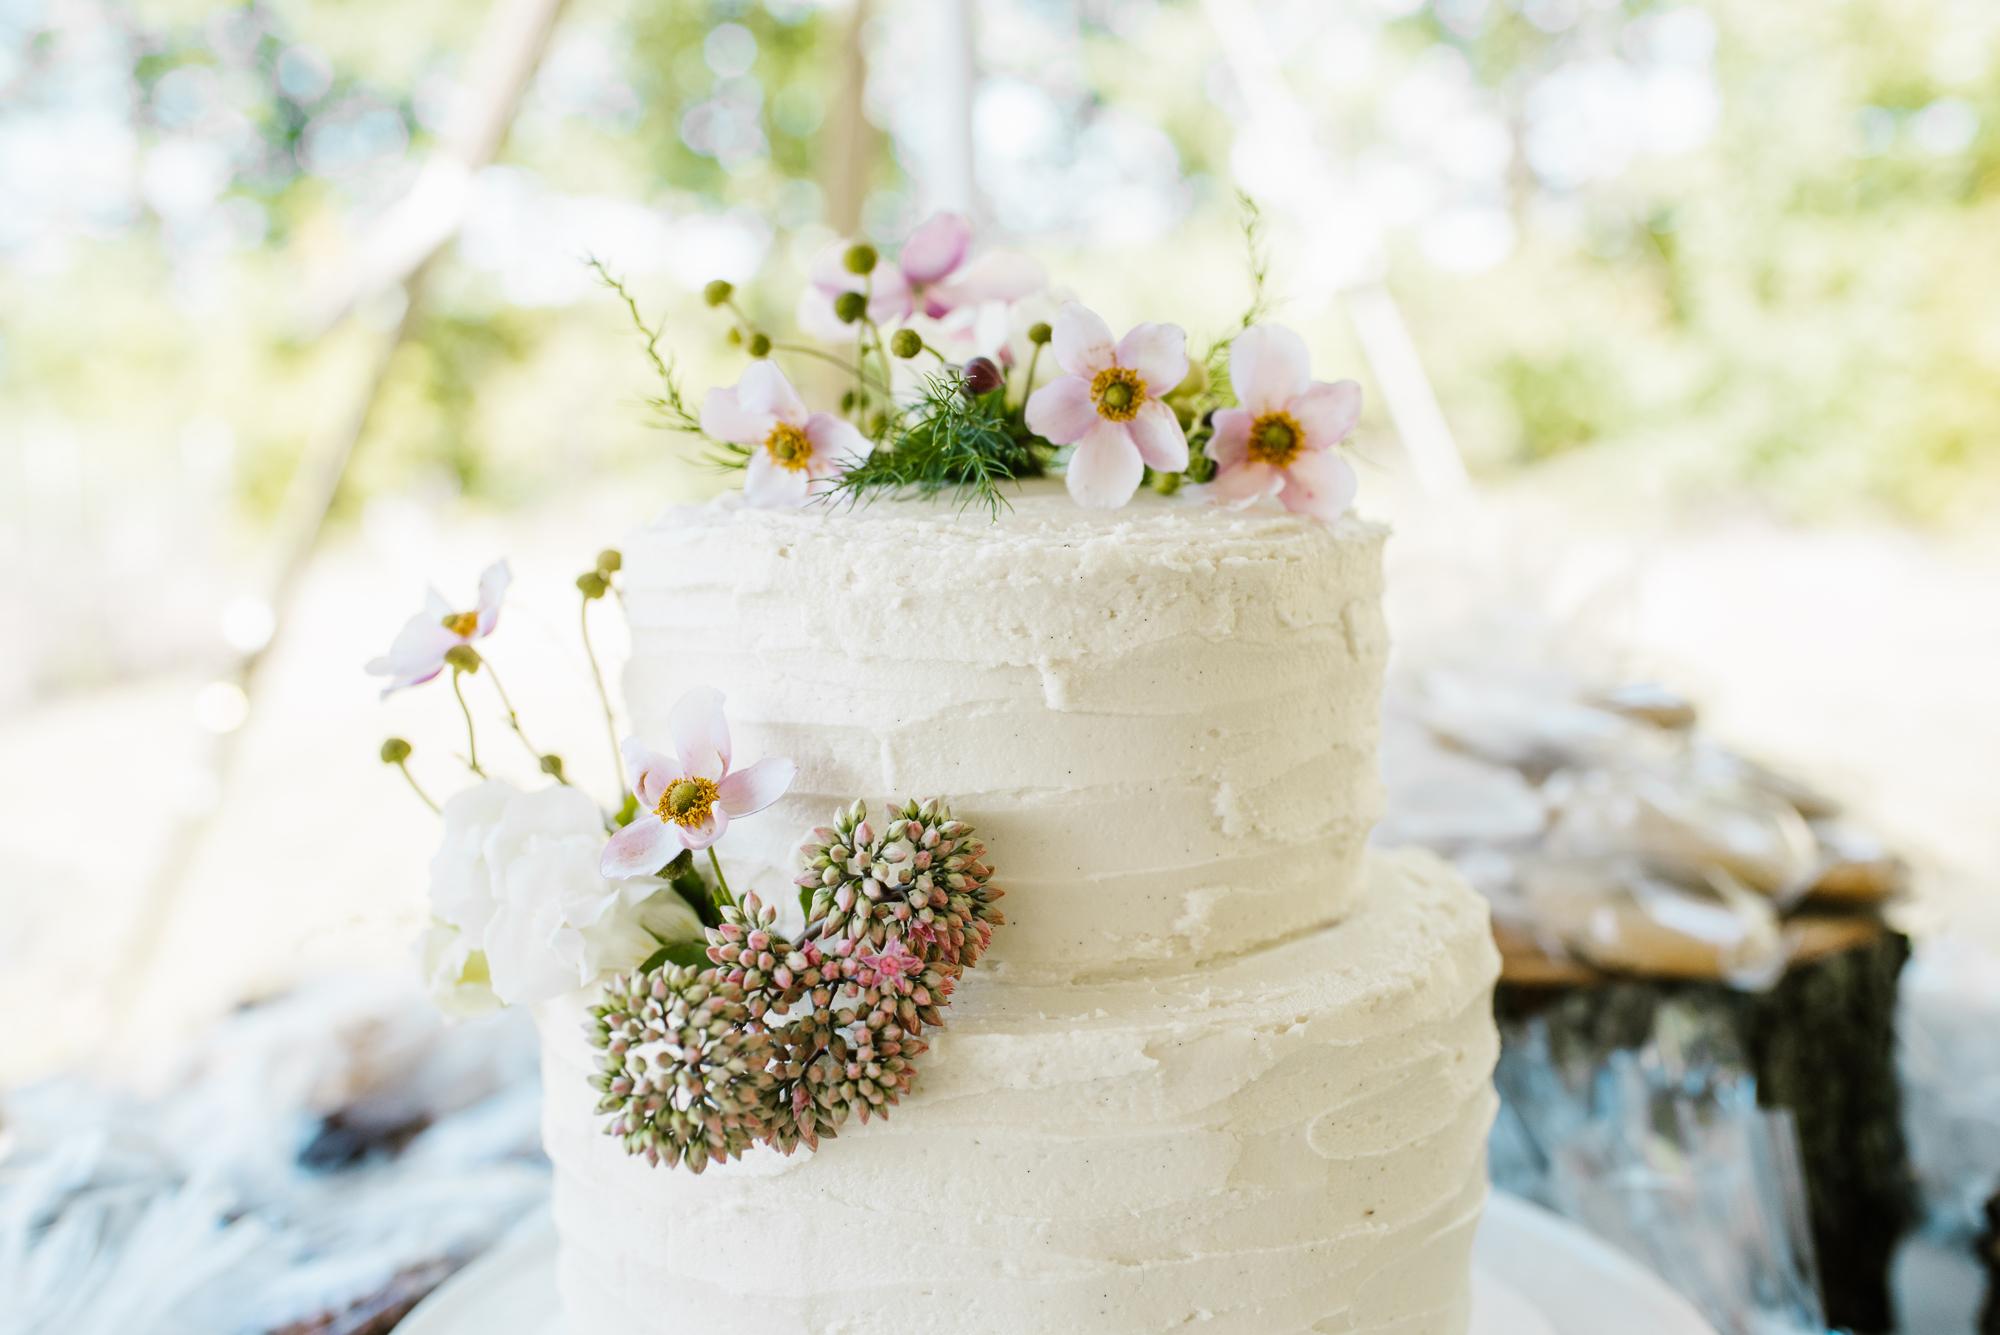 Quincy-Coldwater-Michigan-farm-wedding-photogapher-sydney-marie (8).jpg